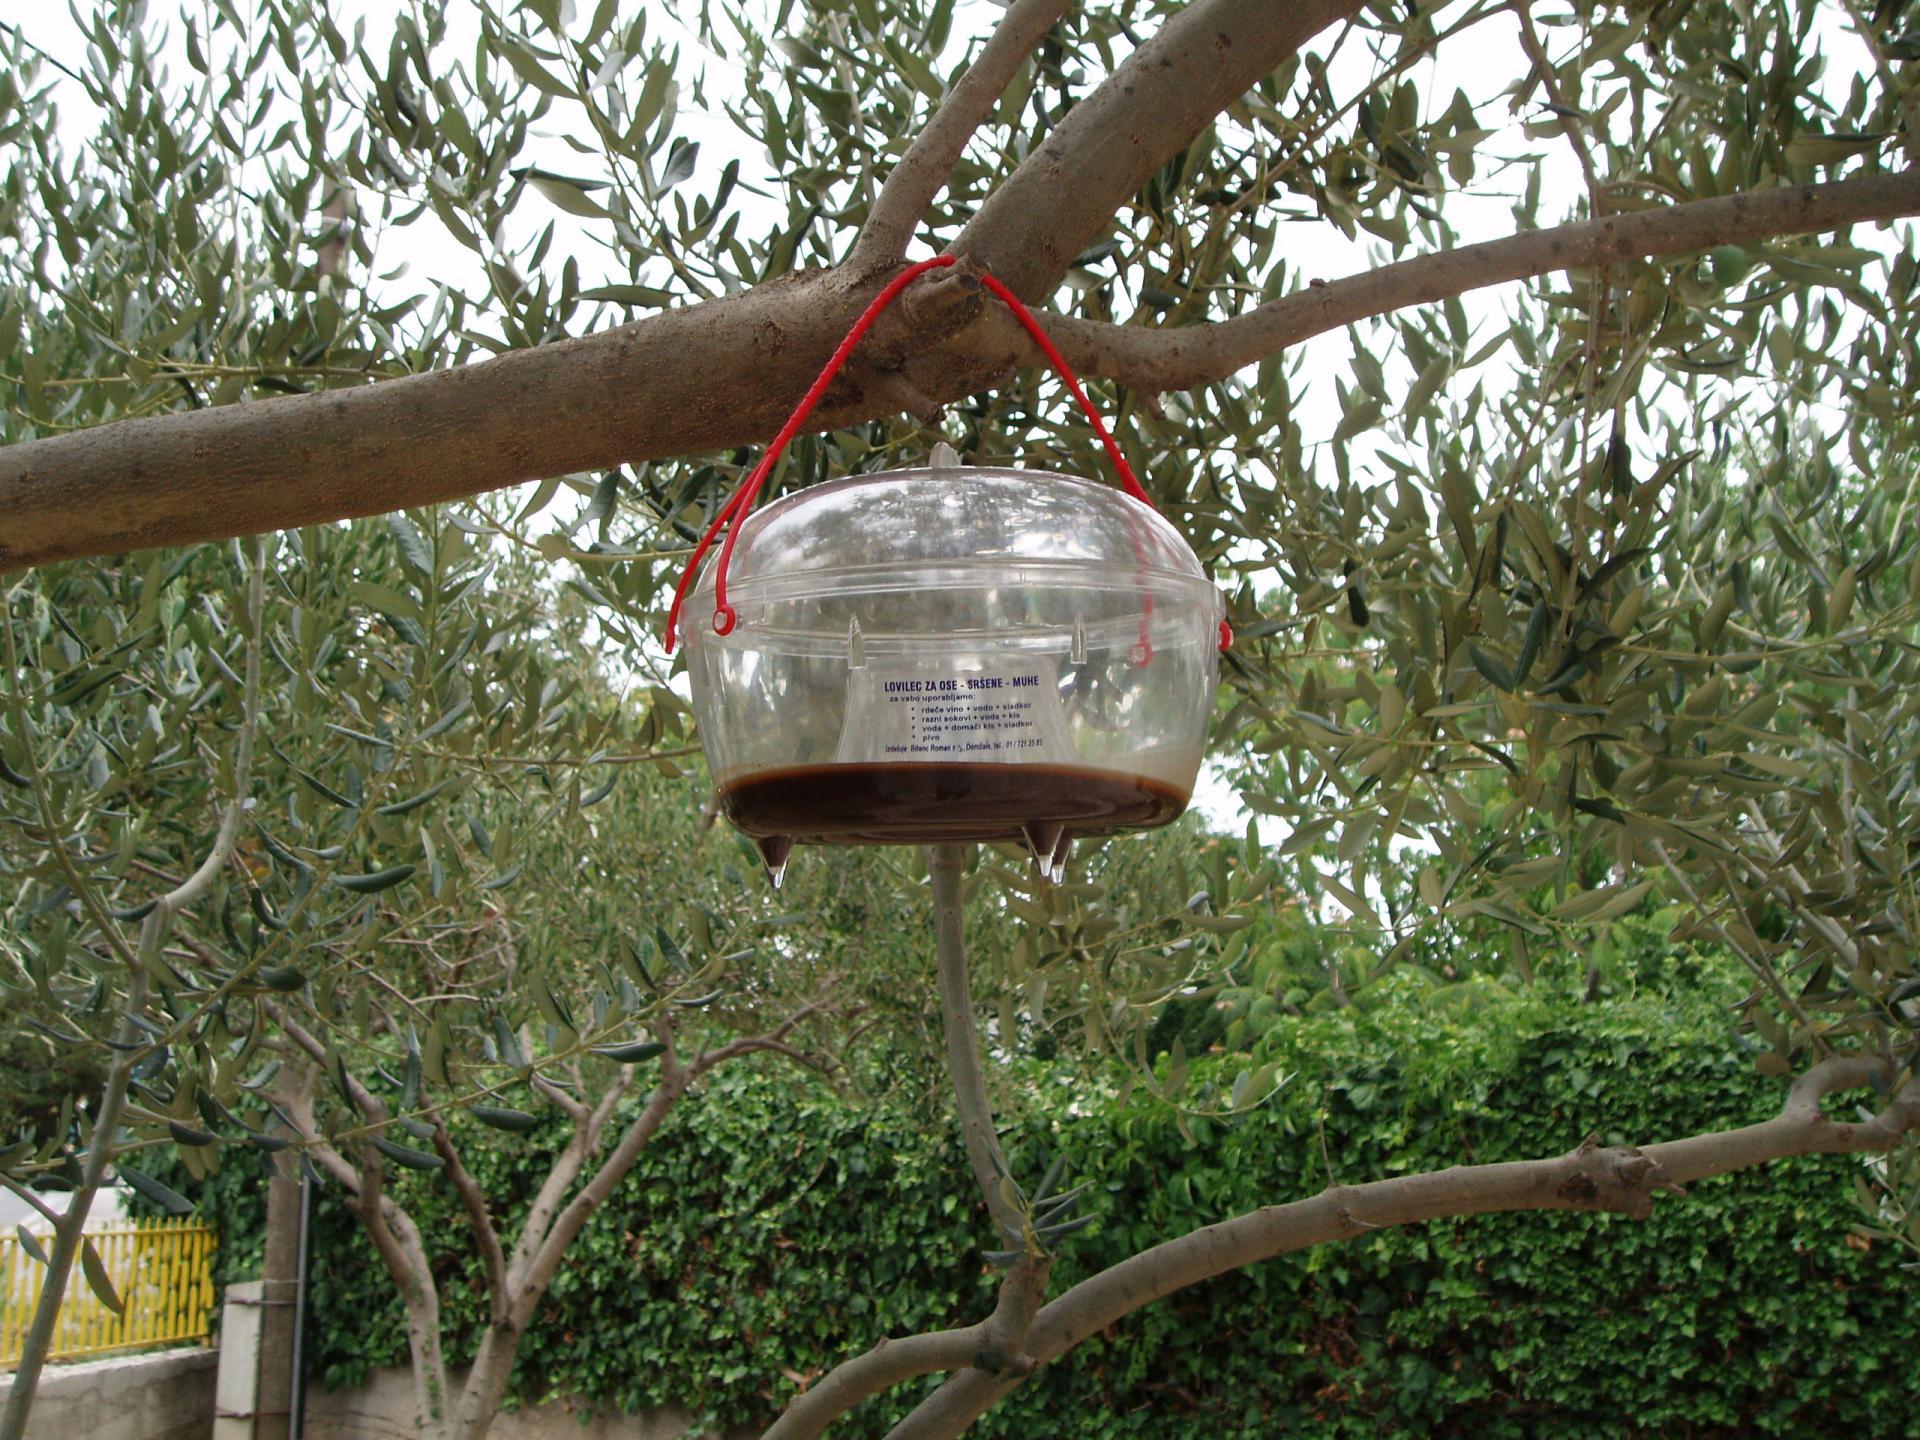 Muholovka punjena hidroliziranim proteinom Buminal i insekticidom